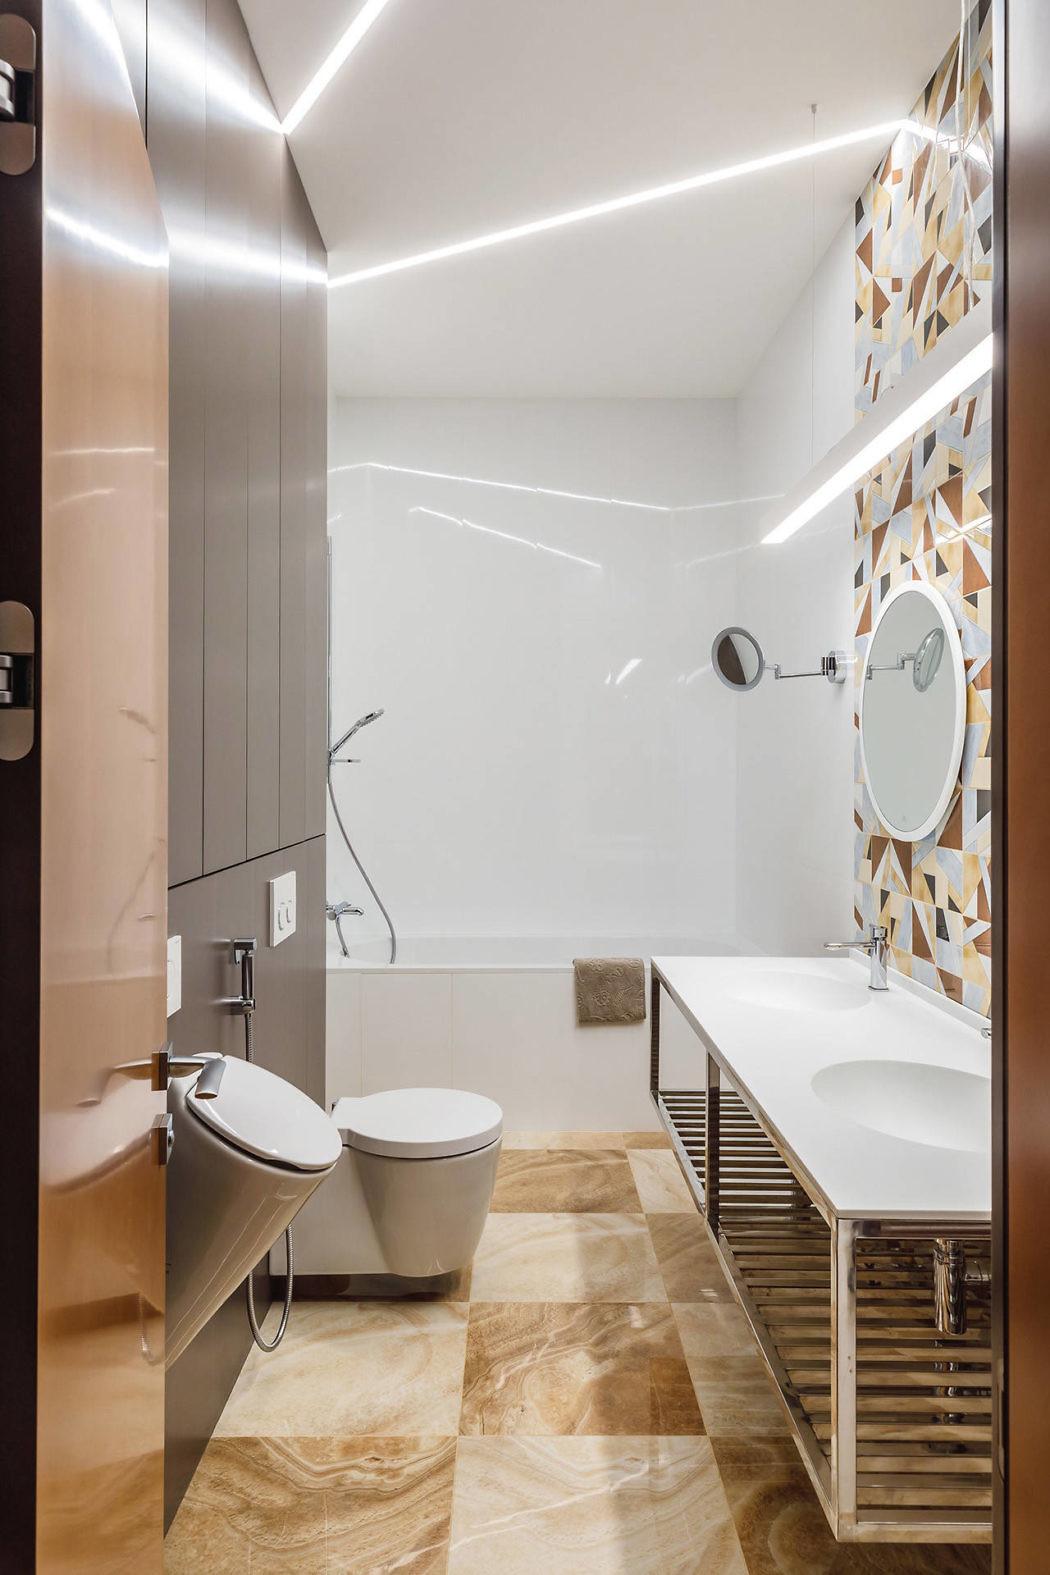 Vintage badkamer door interieurarchitect Andrei Popov